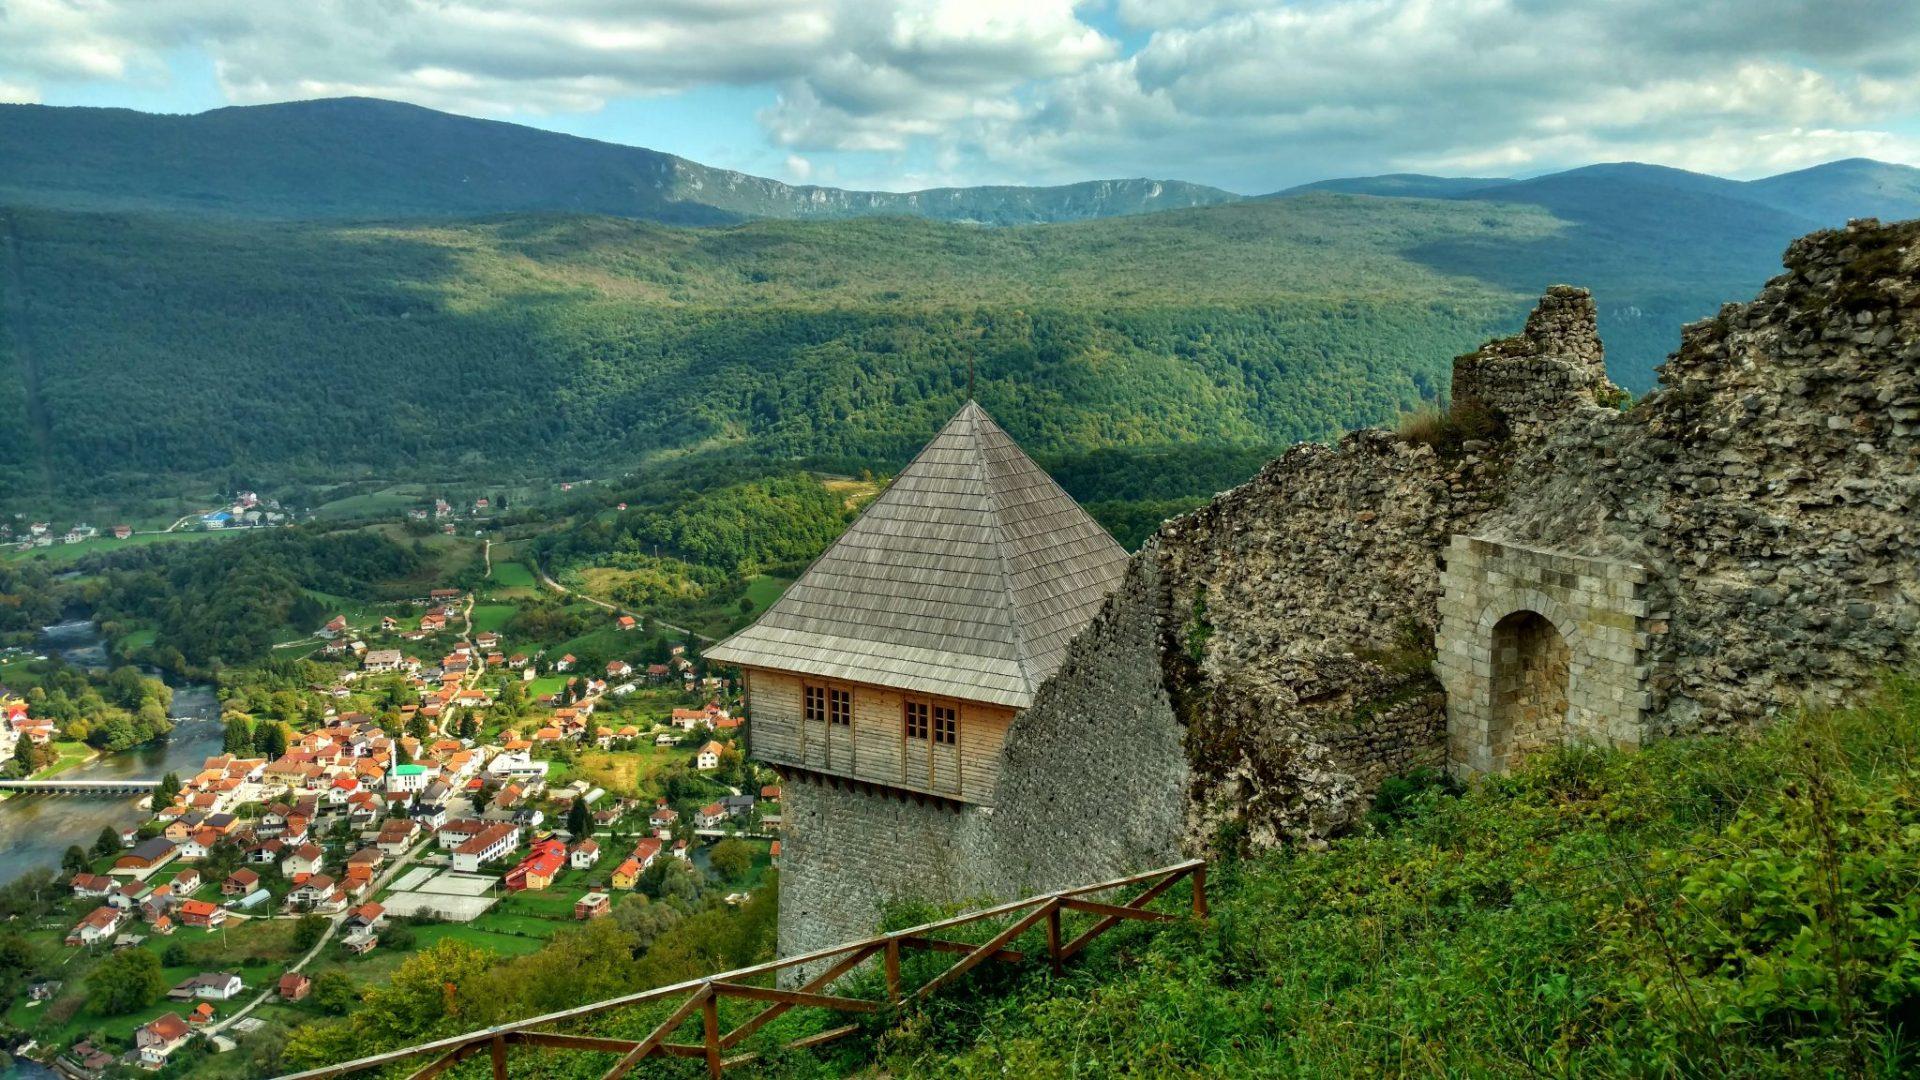 BLOG | Hiking in Una National Park | TRAILNOTES Via Dinarica Green Trail in Bosnia and Herzegovina